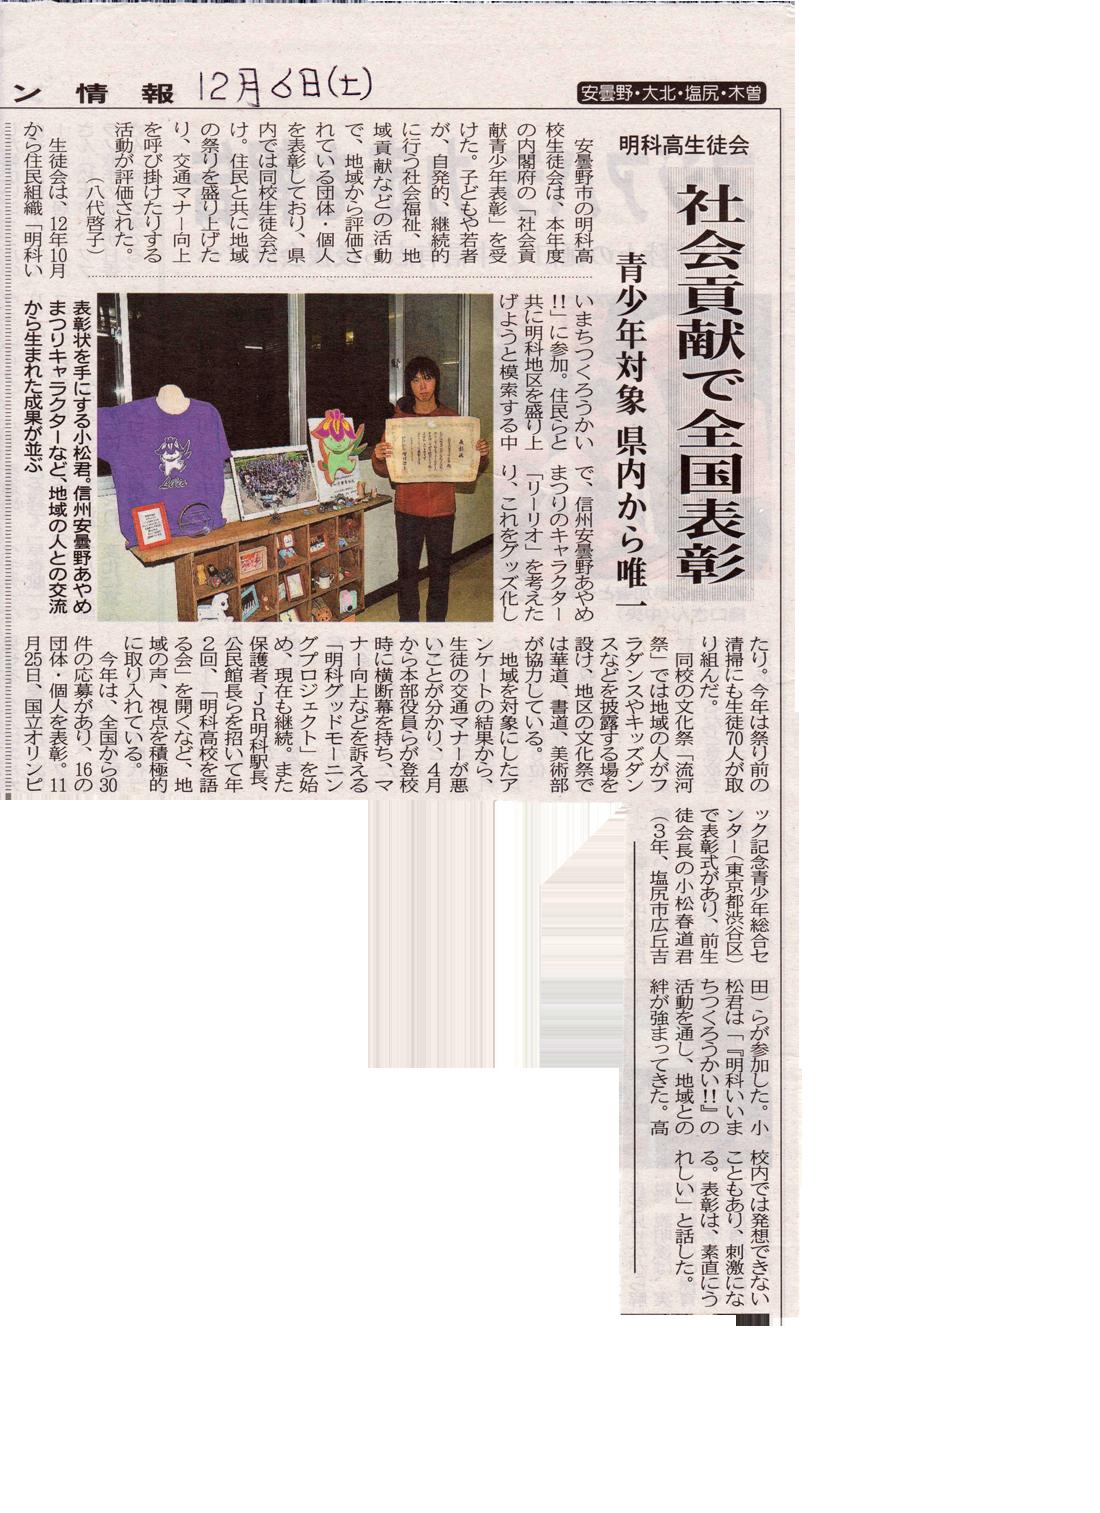 新聞掲載12-6